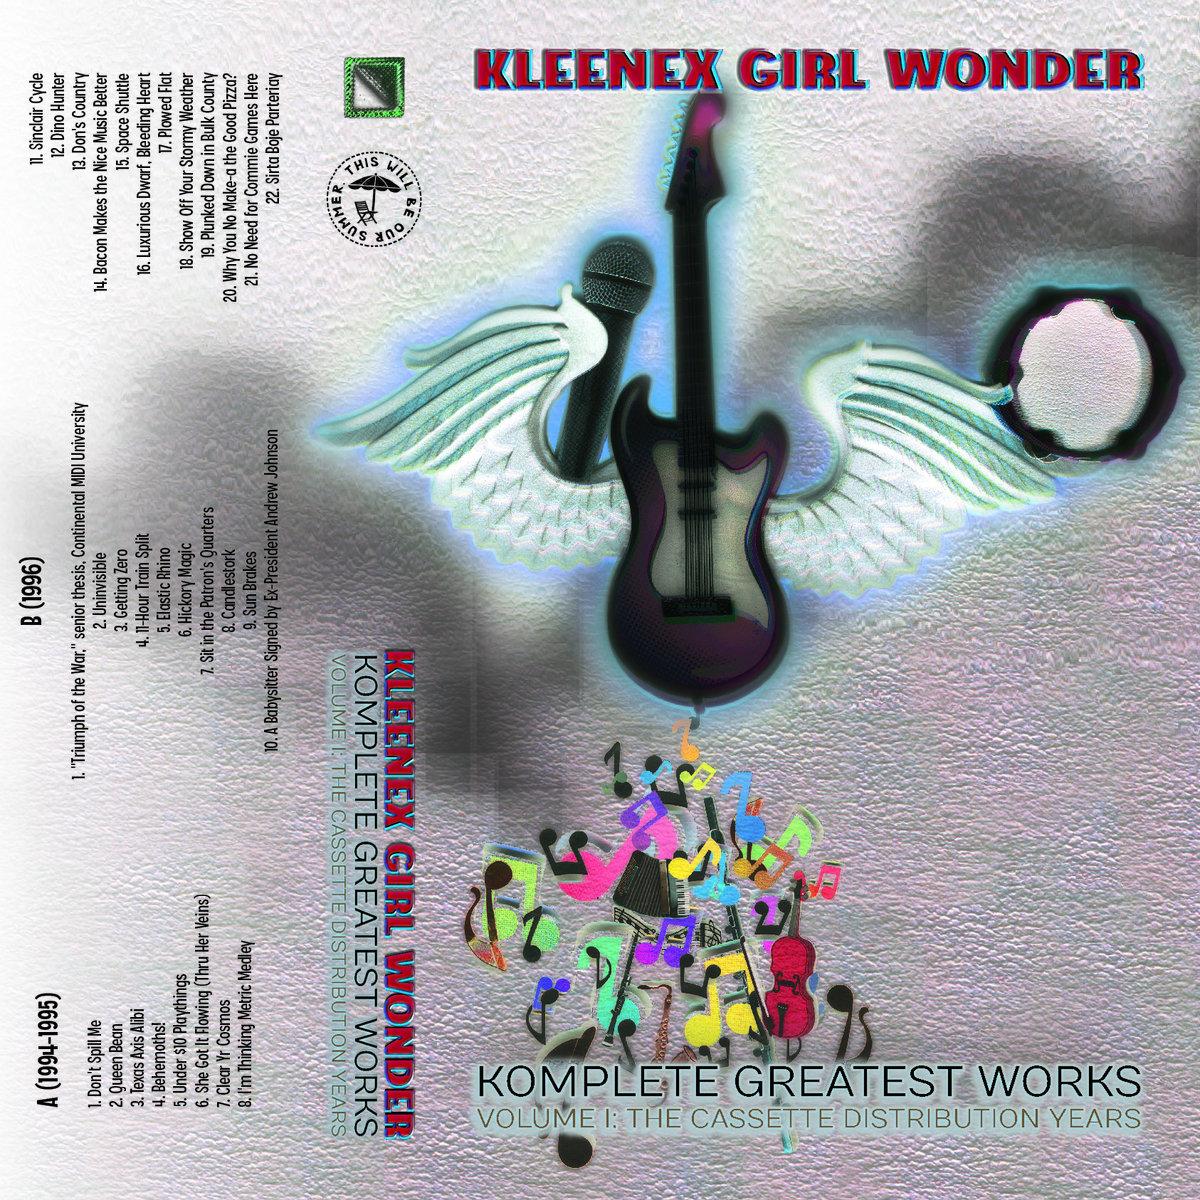 Komplete Greatest Works Vol  1 | Kleenex Girl Wonder